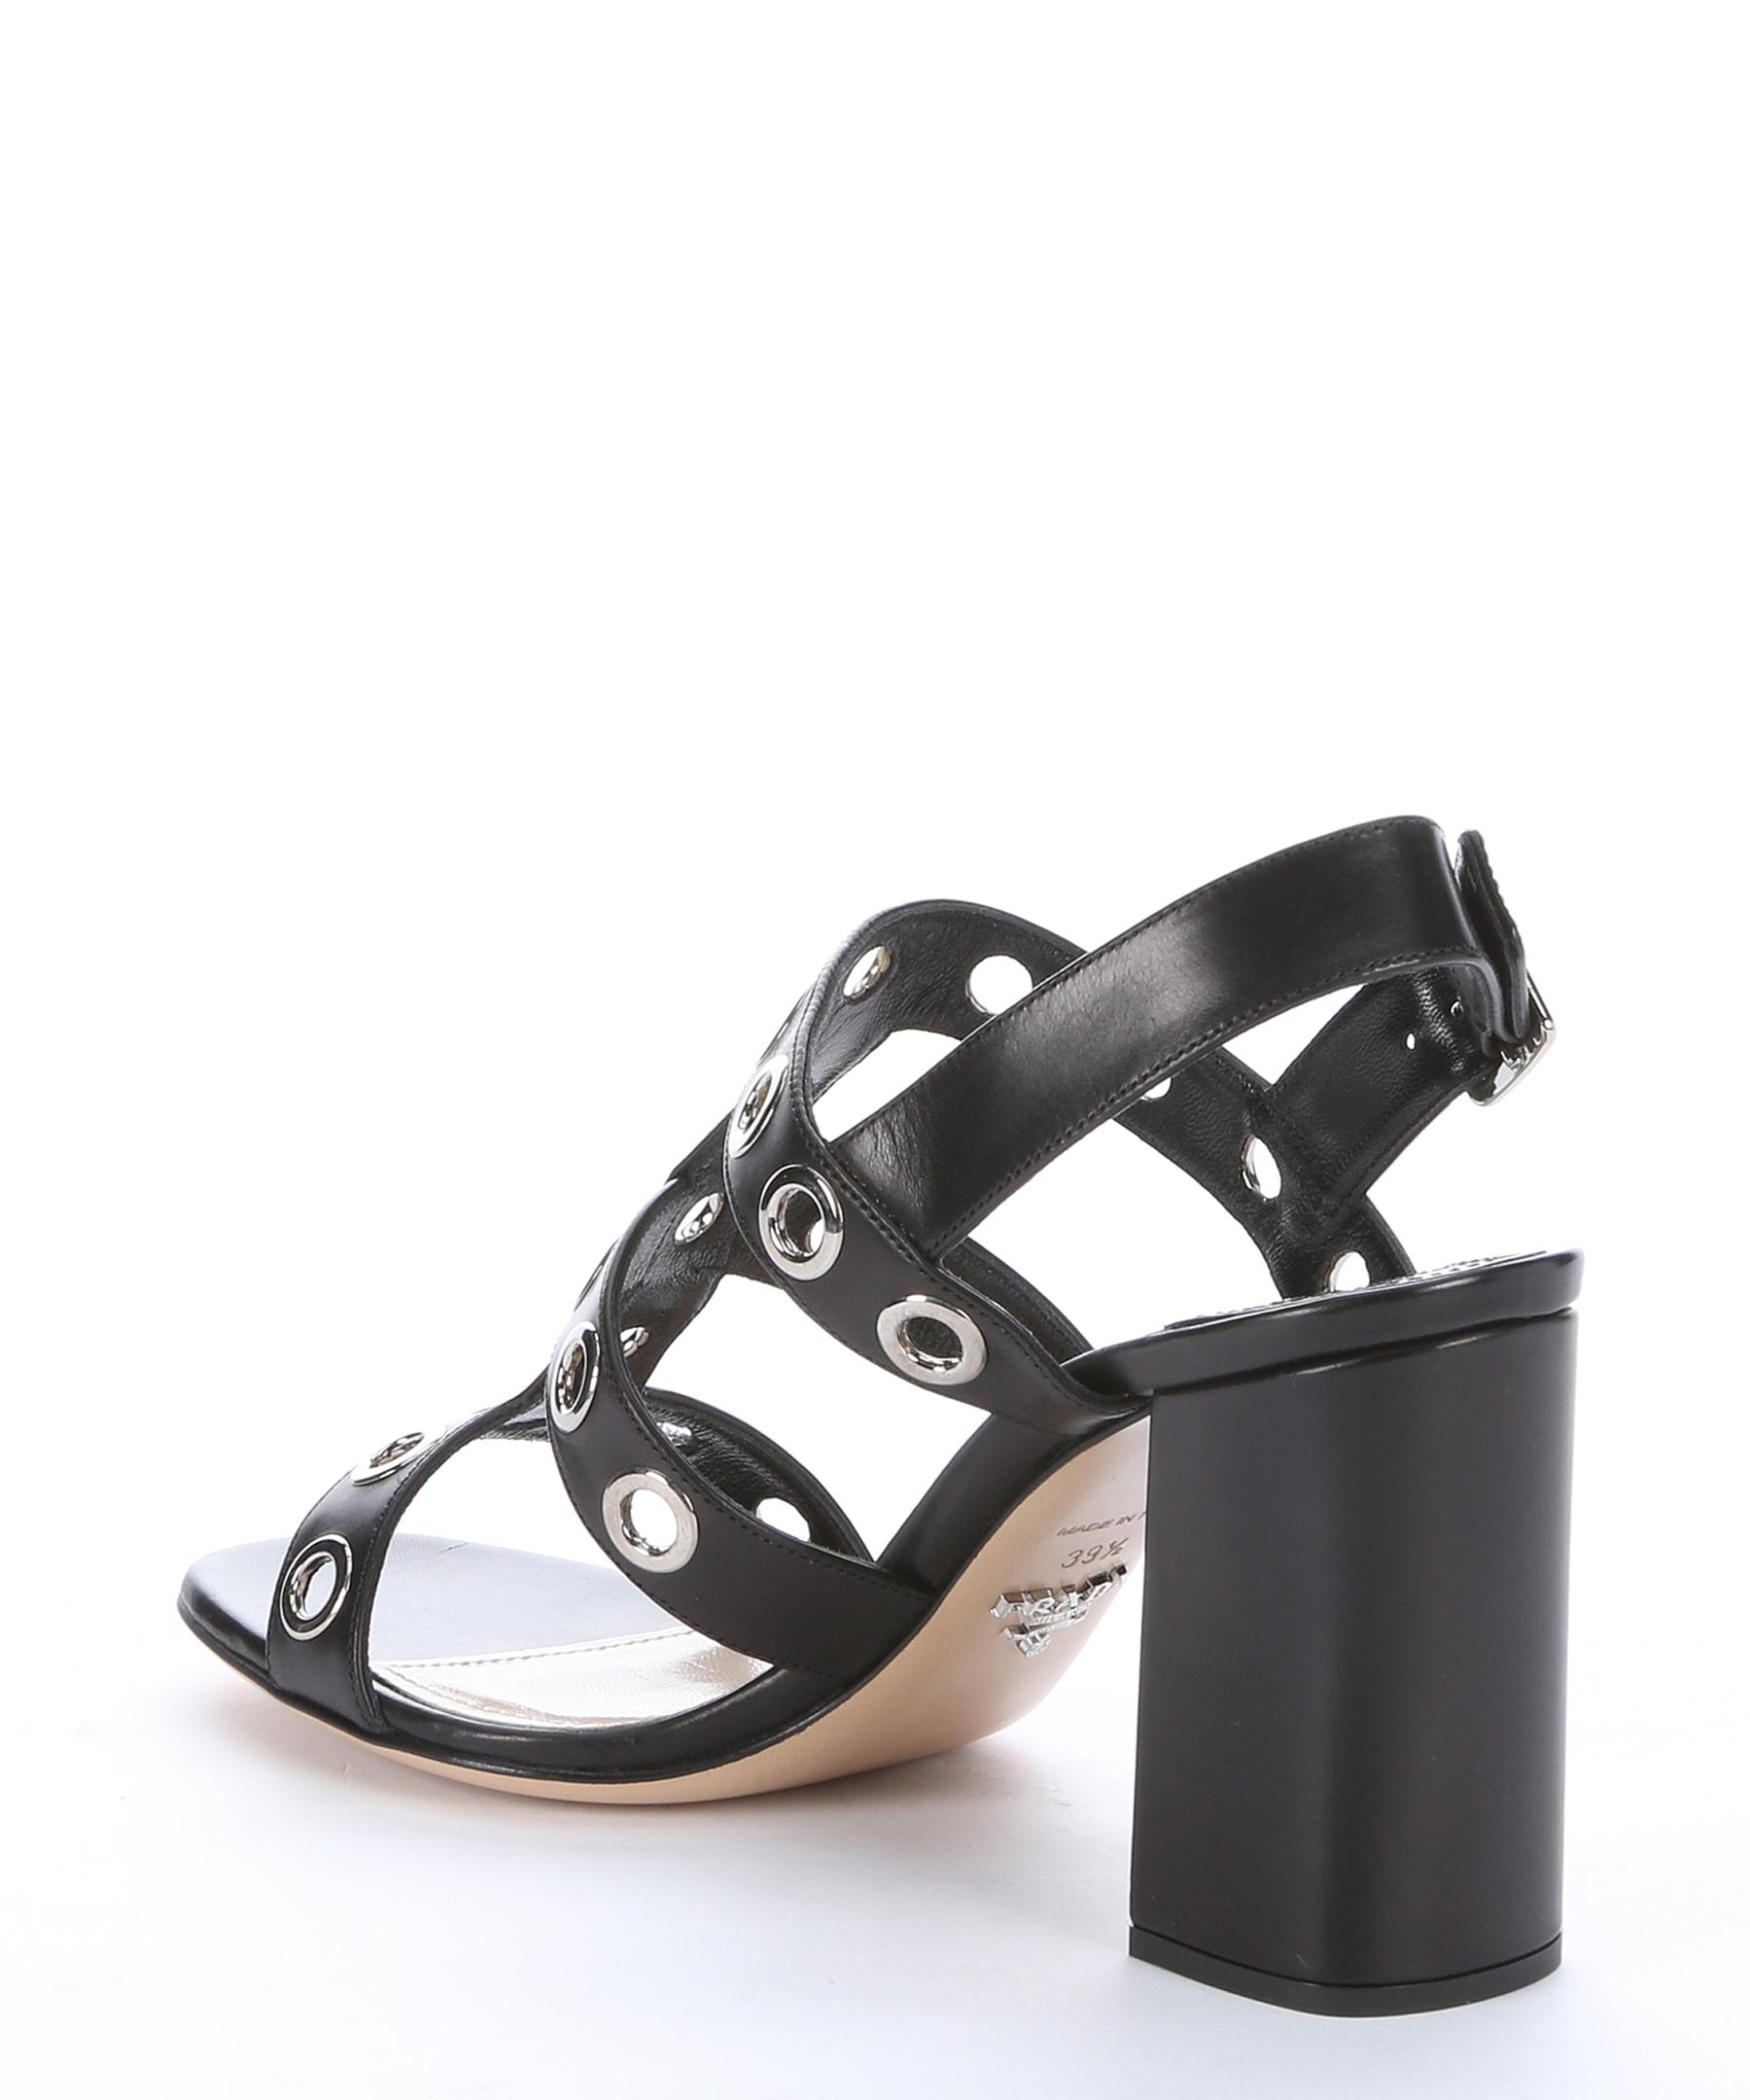 cheap sale explore Prada Grommet Slingback Sandals free shipping good selling 79rd4